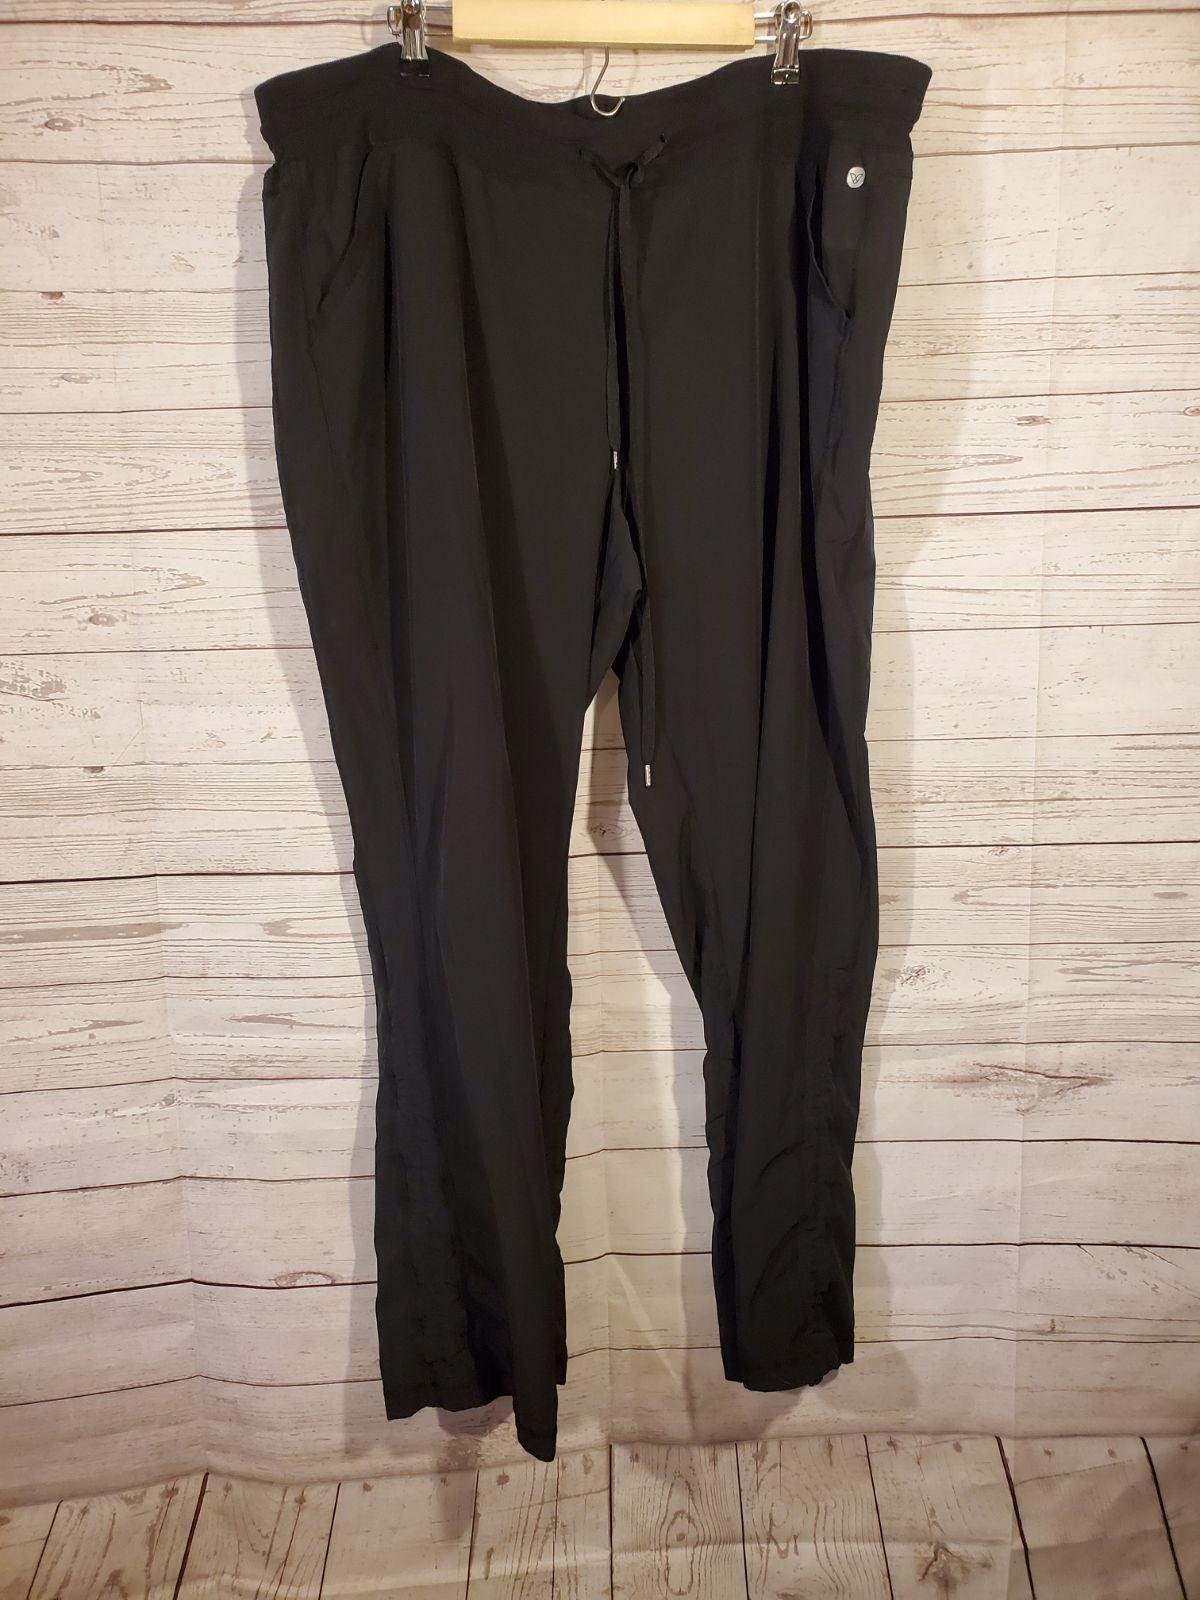 Livi Active Sz 22/24 Black Pants